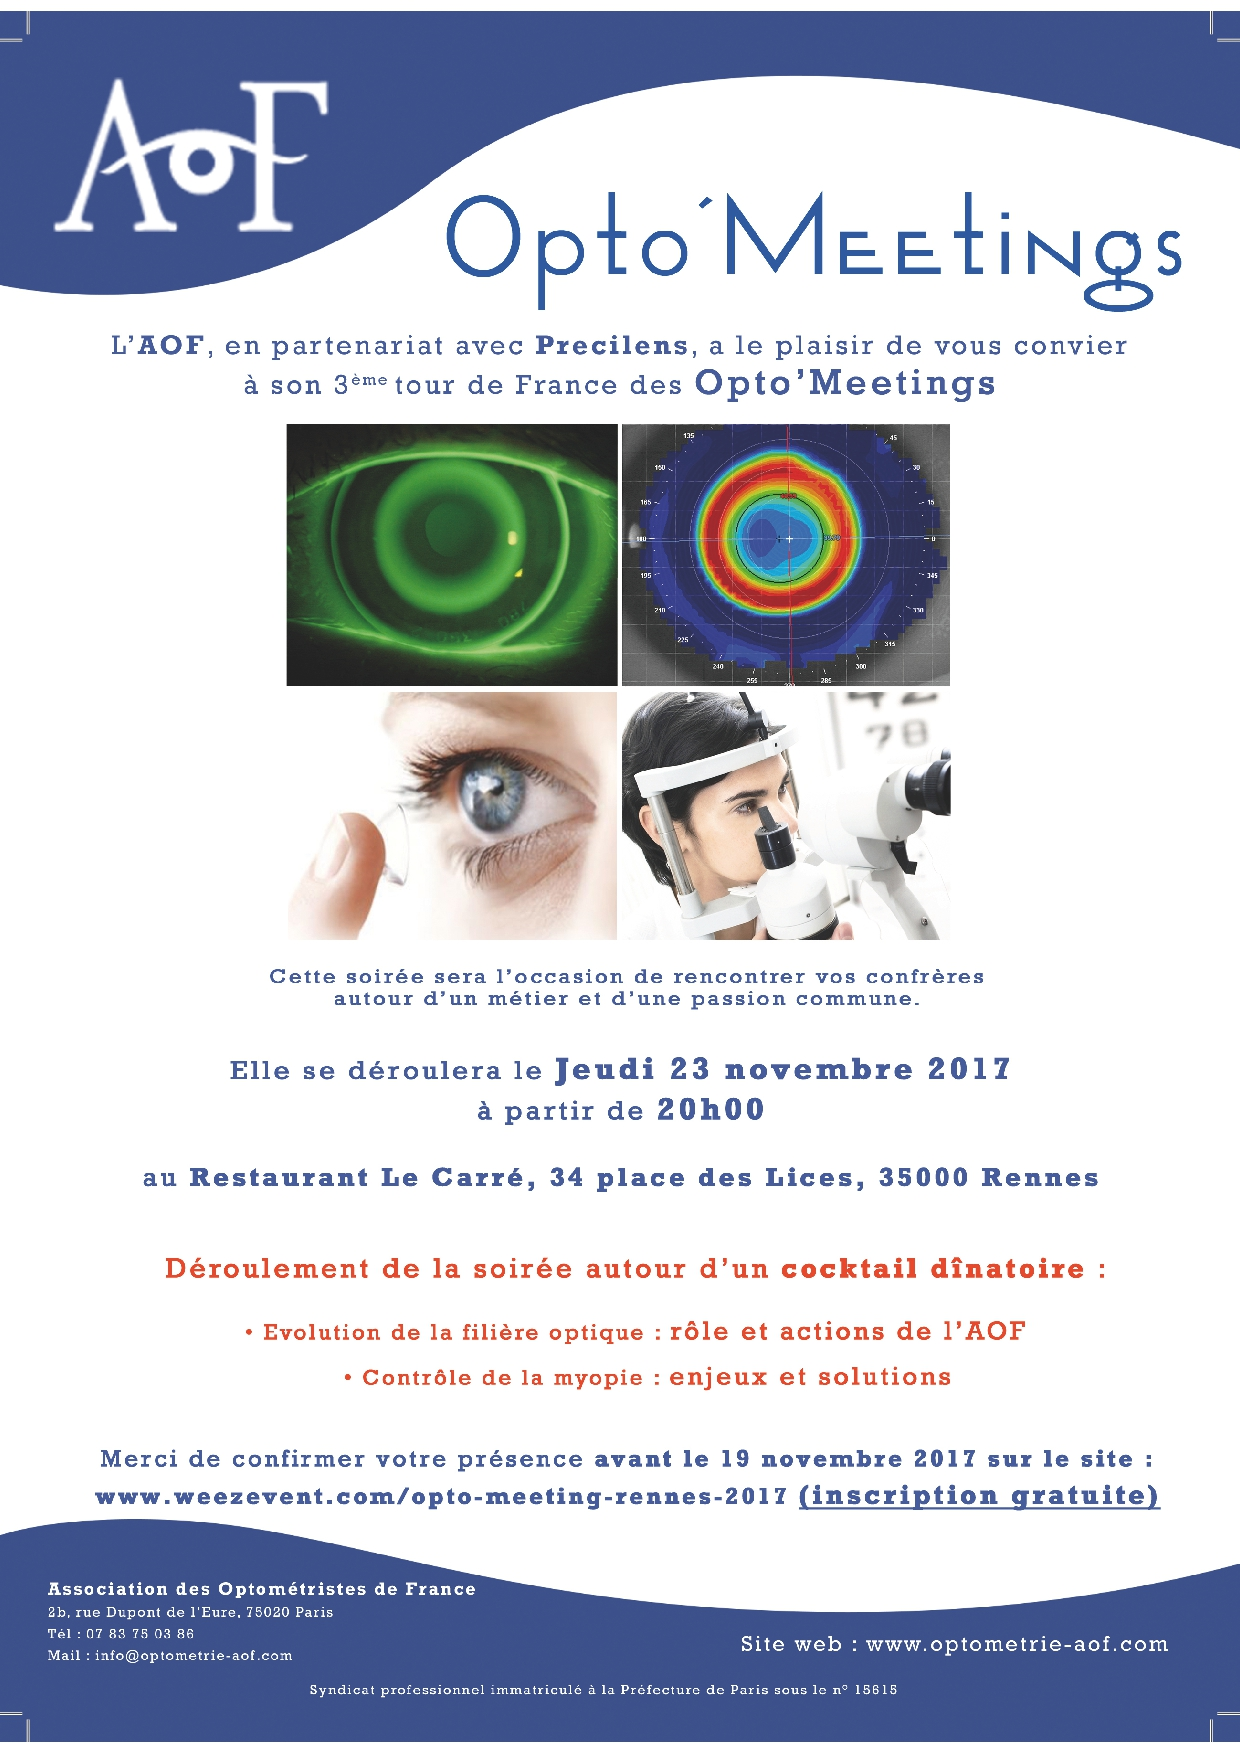 Opto'Meeting RENNES : Inscription gratuite.